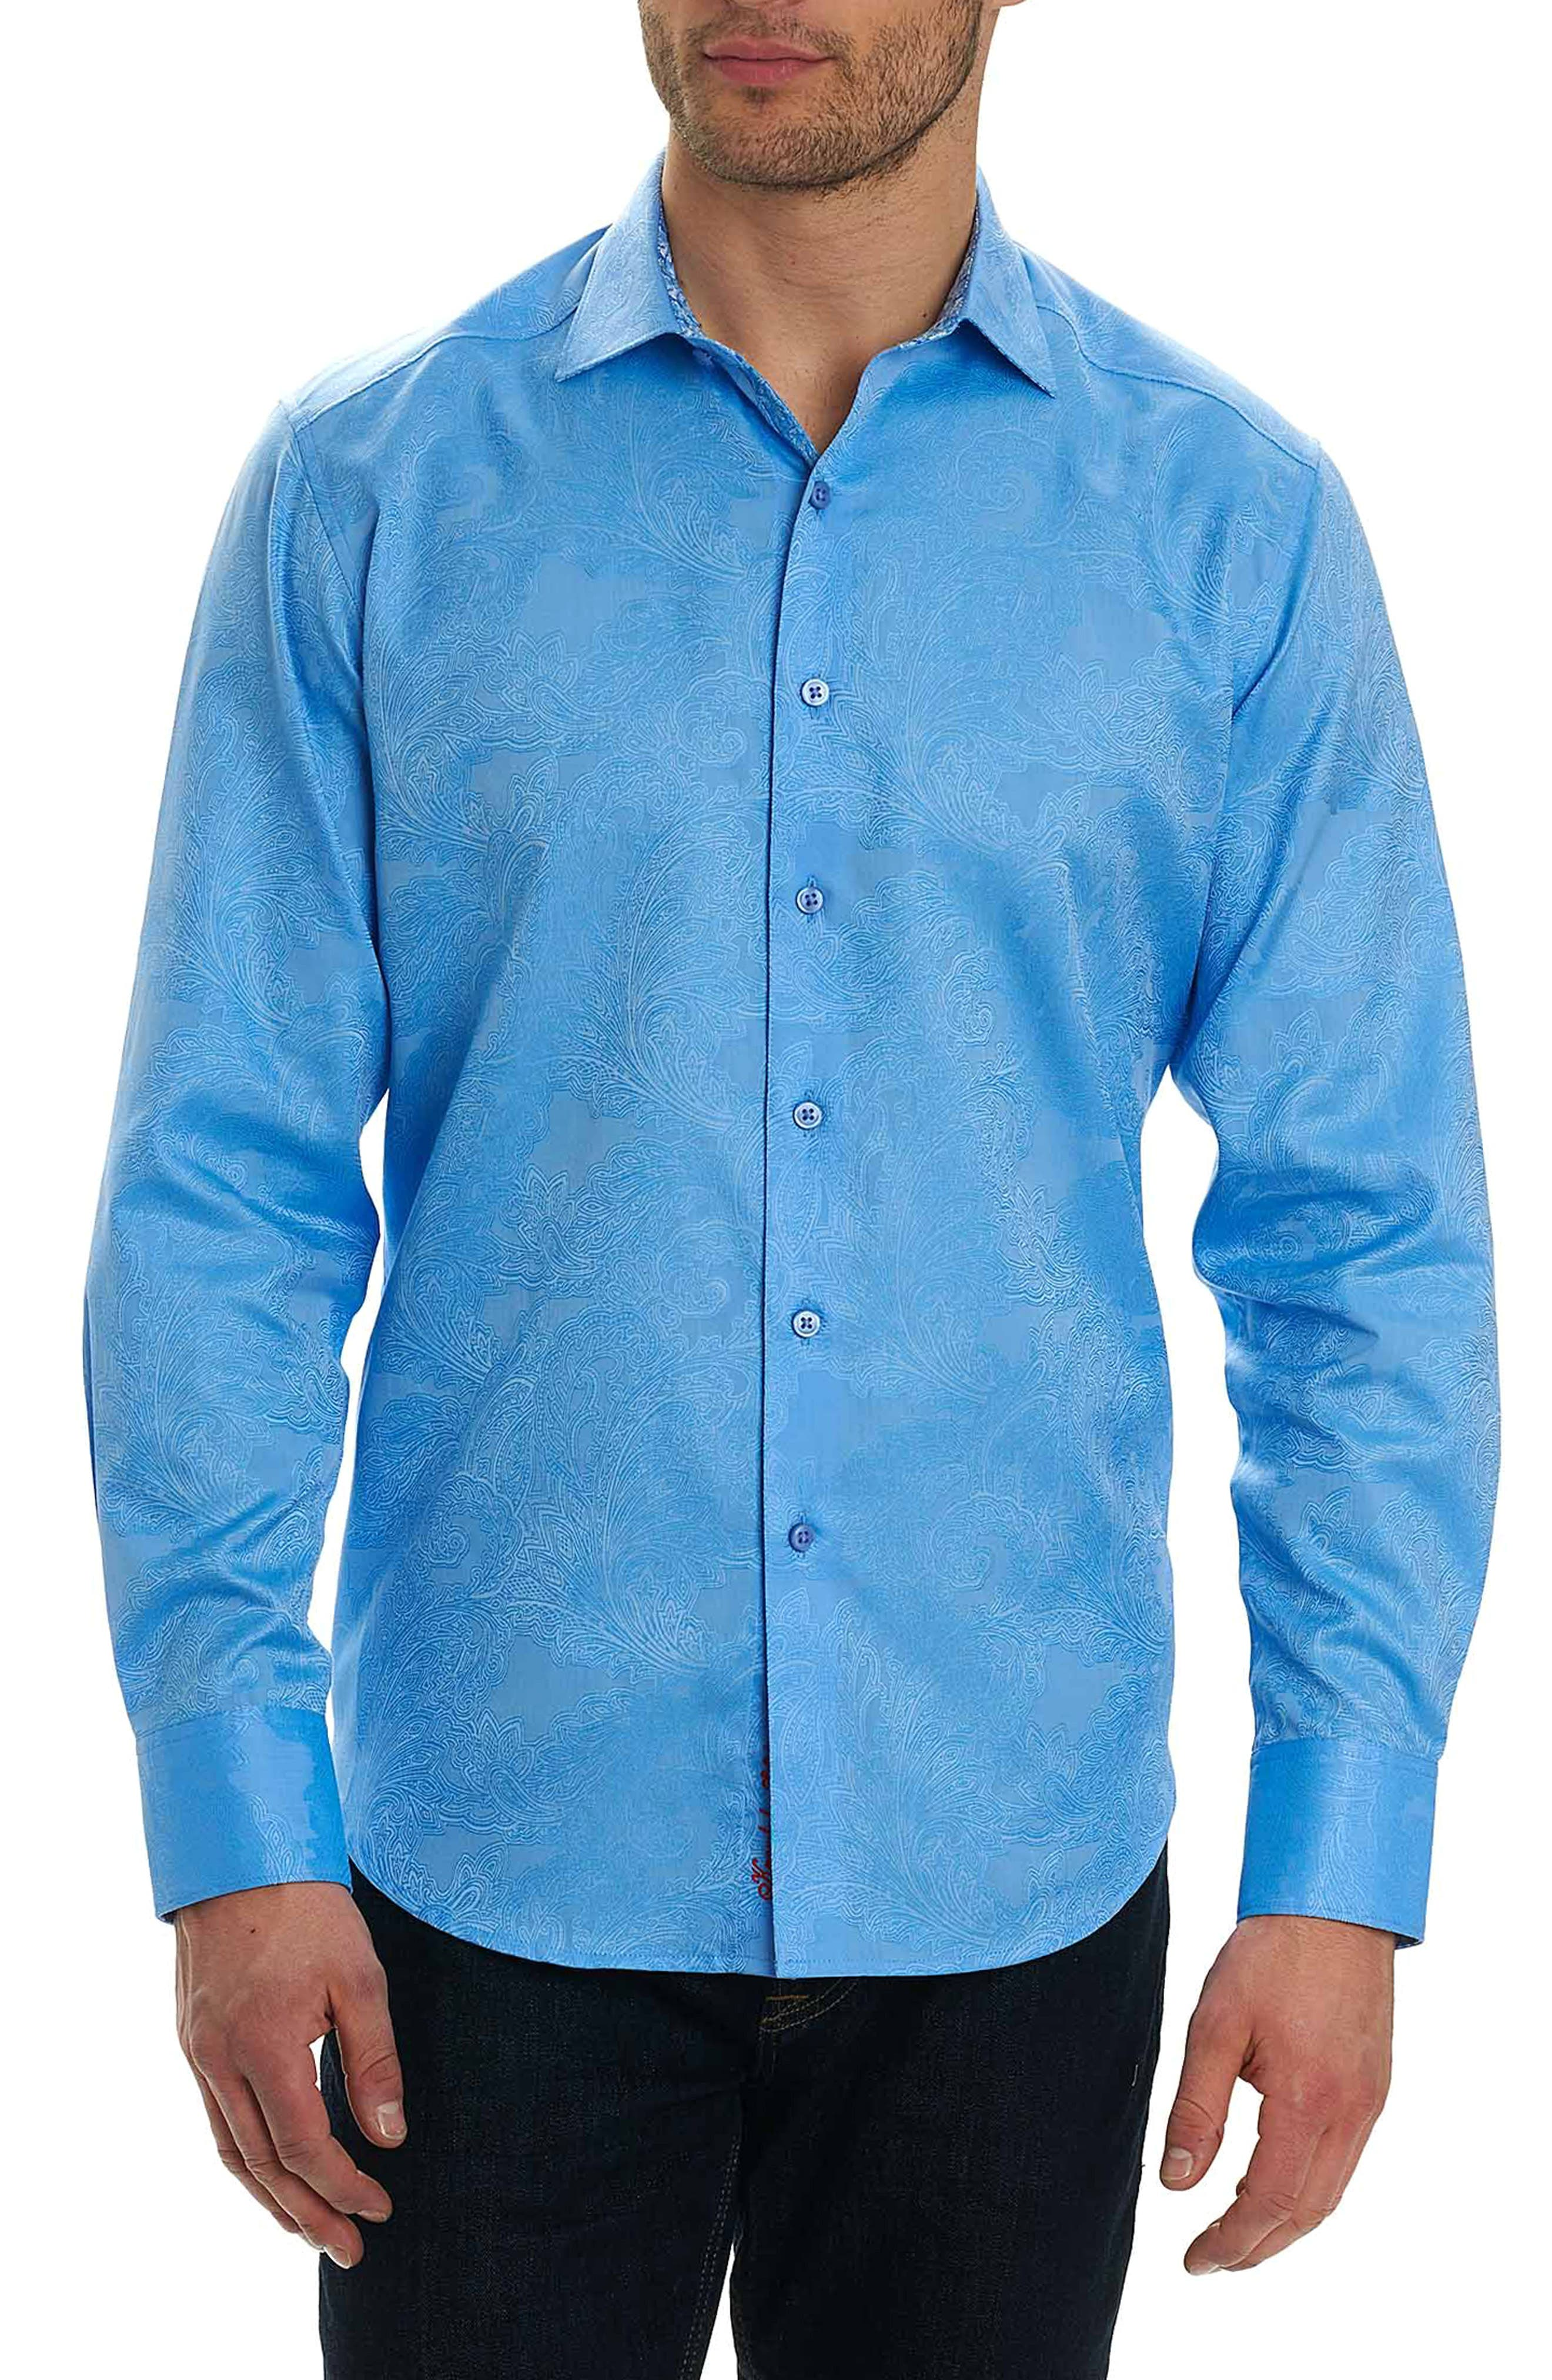 Rosendale Classic Fit Jacquard Sport Shirt,                         Main,                         color, Light Blue